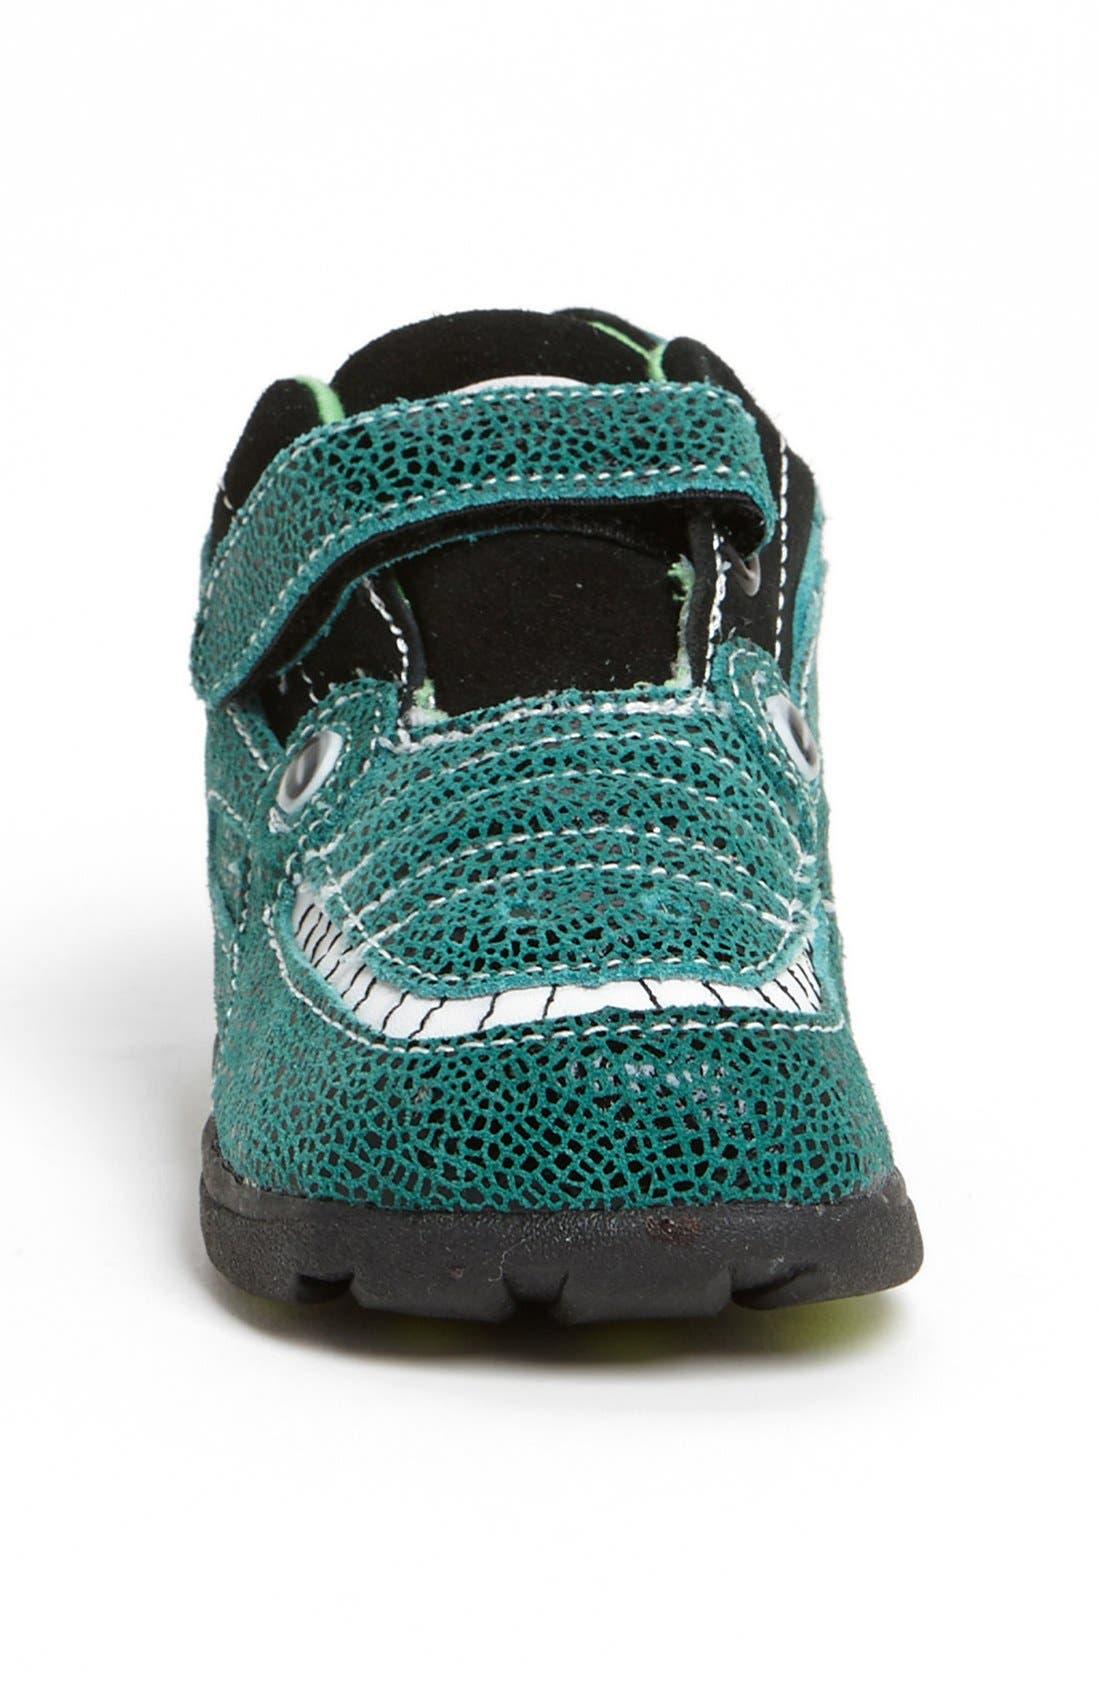 Alternate Image 3  - Zooligans™ 'Jacques the Gator' Sneaker (Baby, Walker, Toddler & Little Kid)